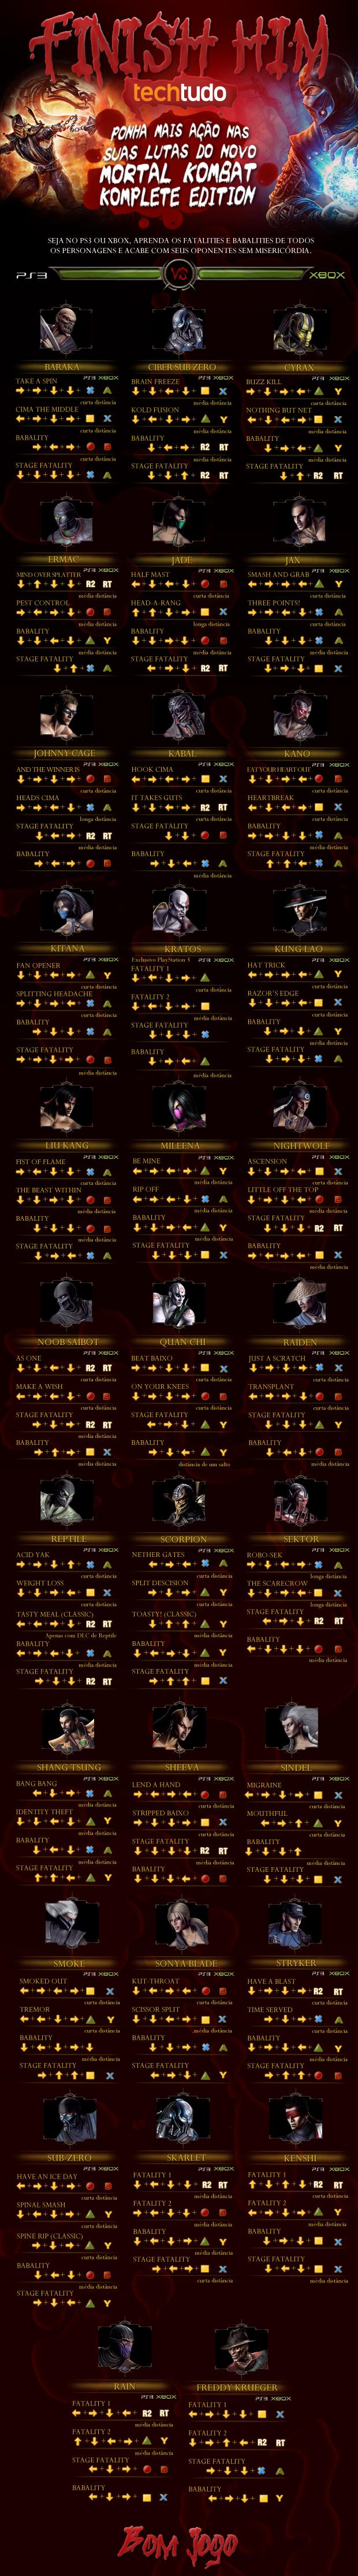 Lista de fatalities de Mortal Kombat